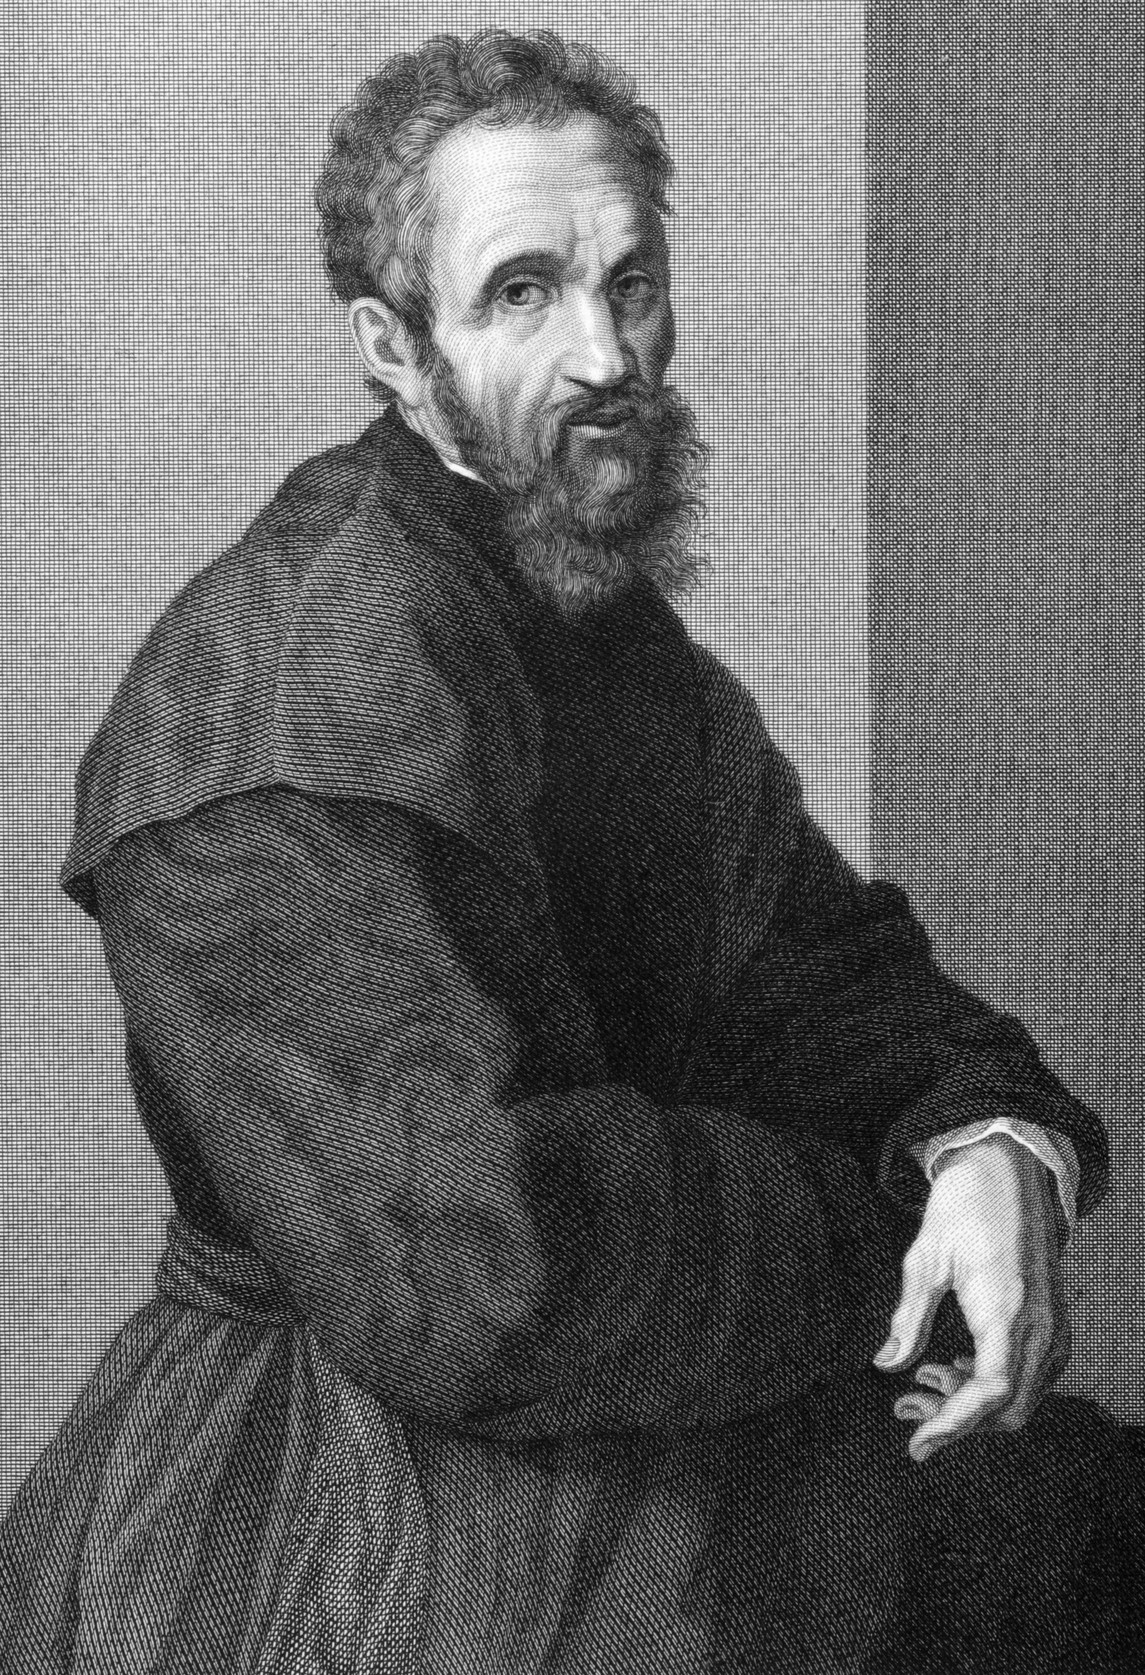 Michelangelo-blog